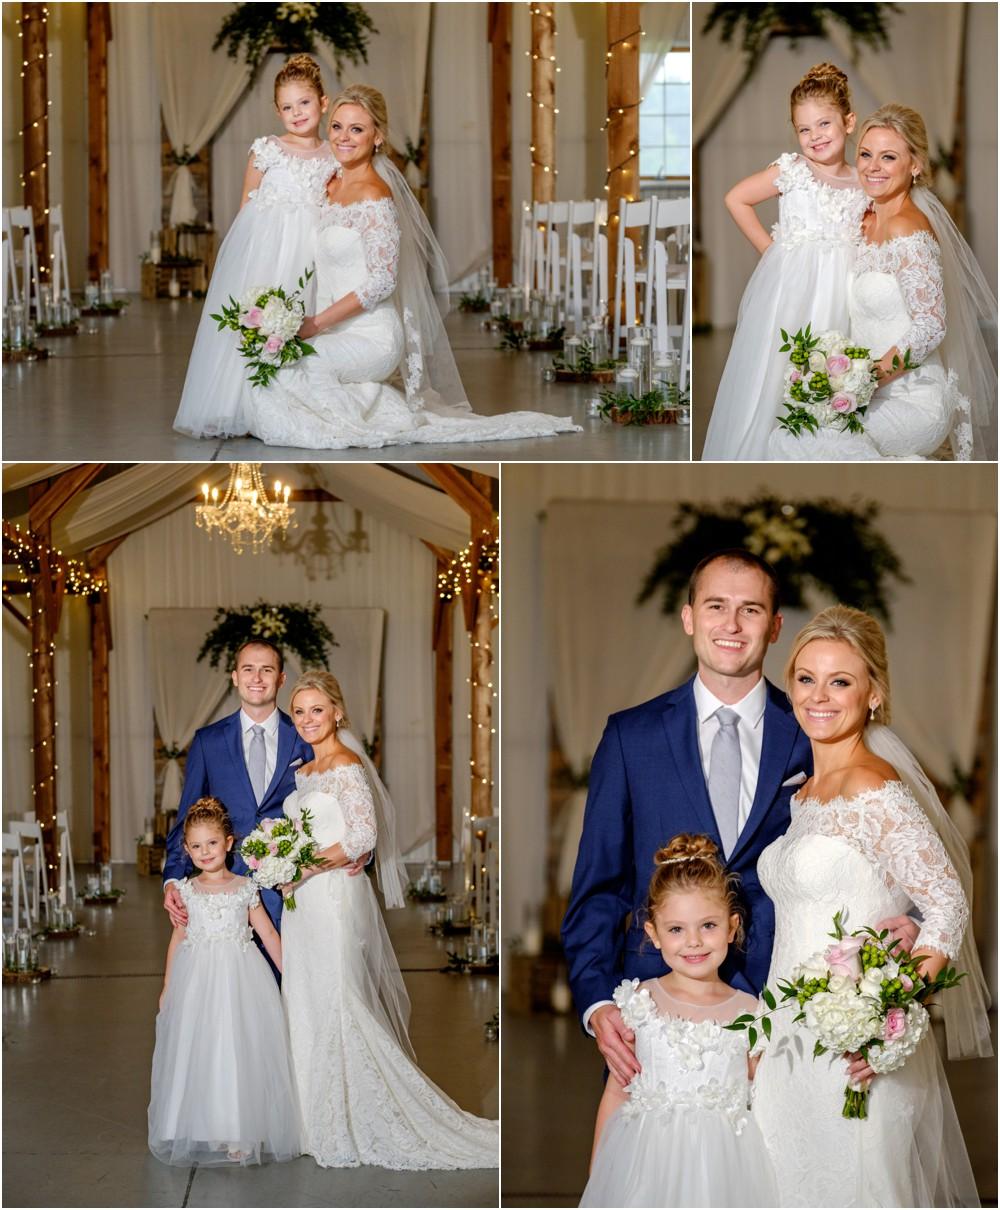 wedding-pictures-at-JLH-Wedding-Barn_0010.jpg